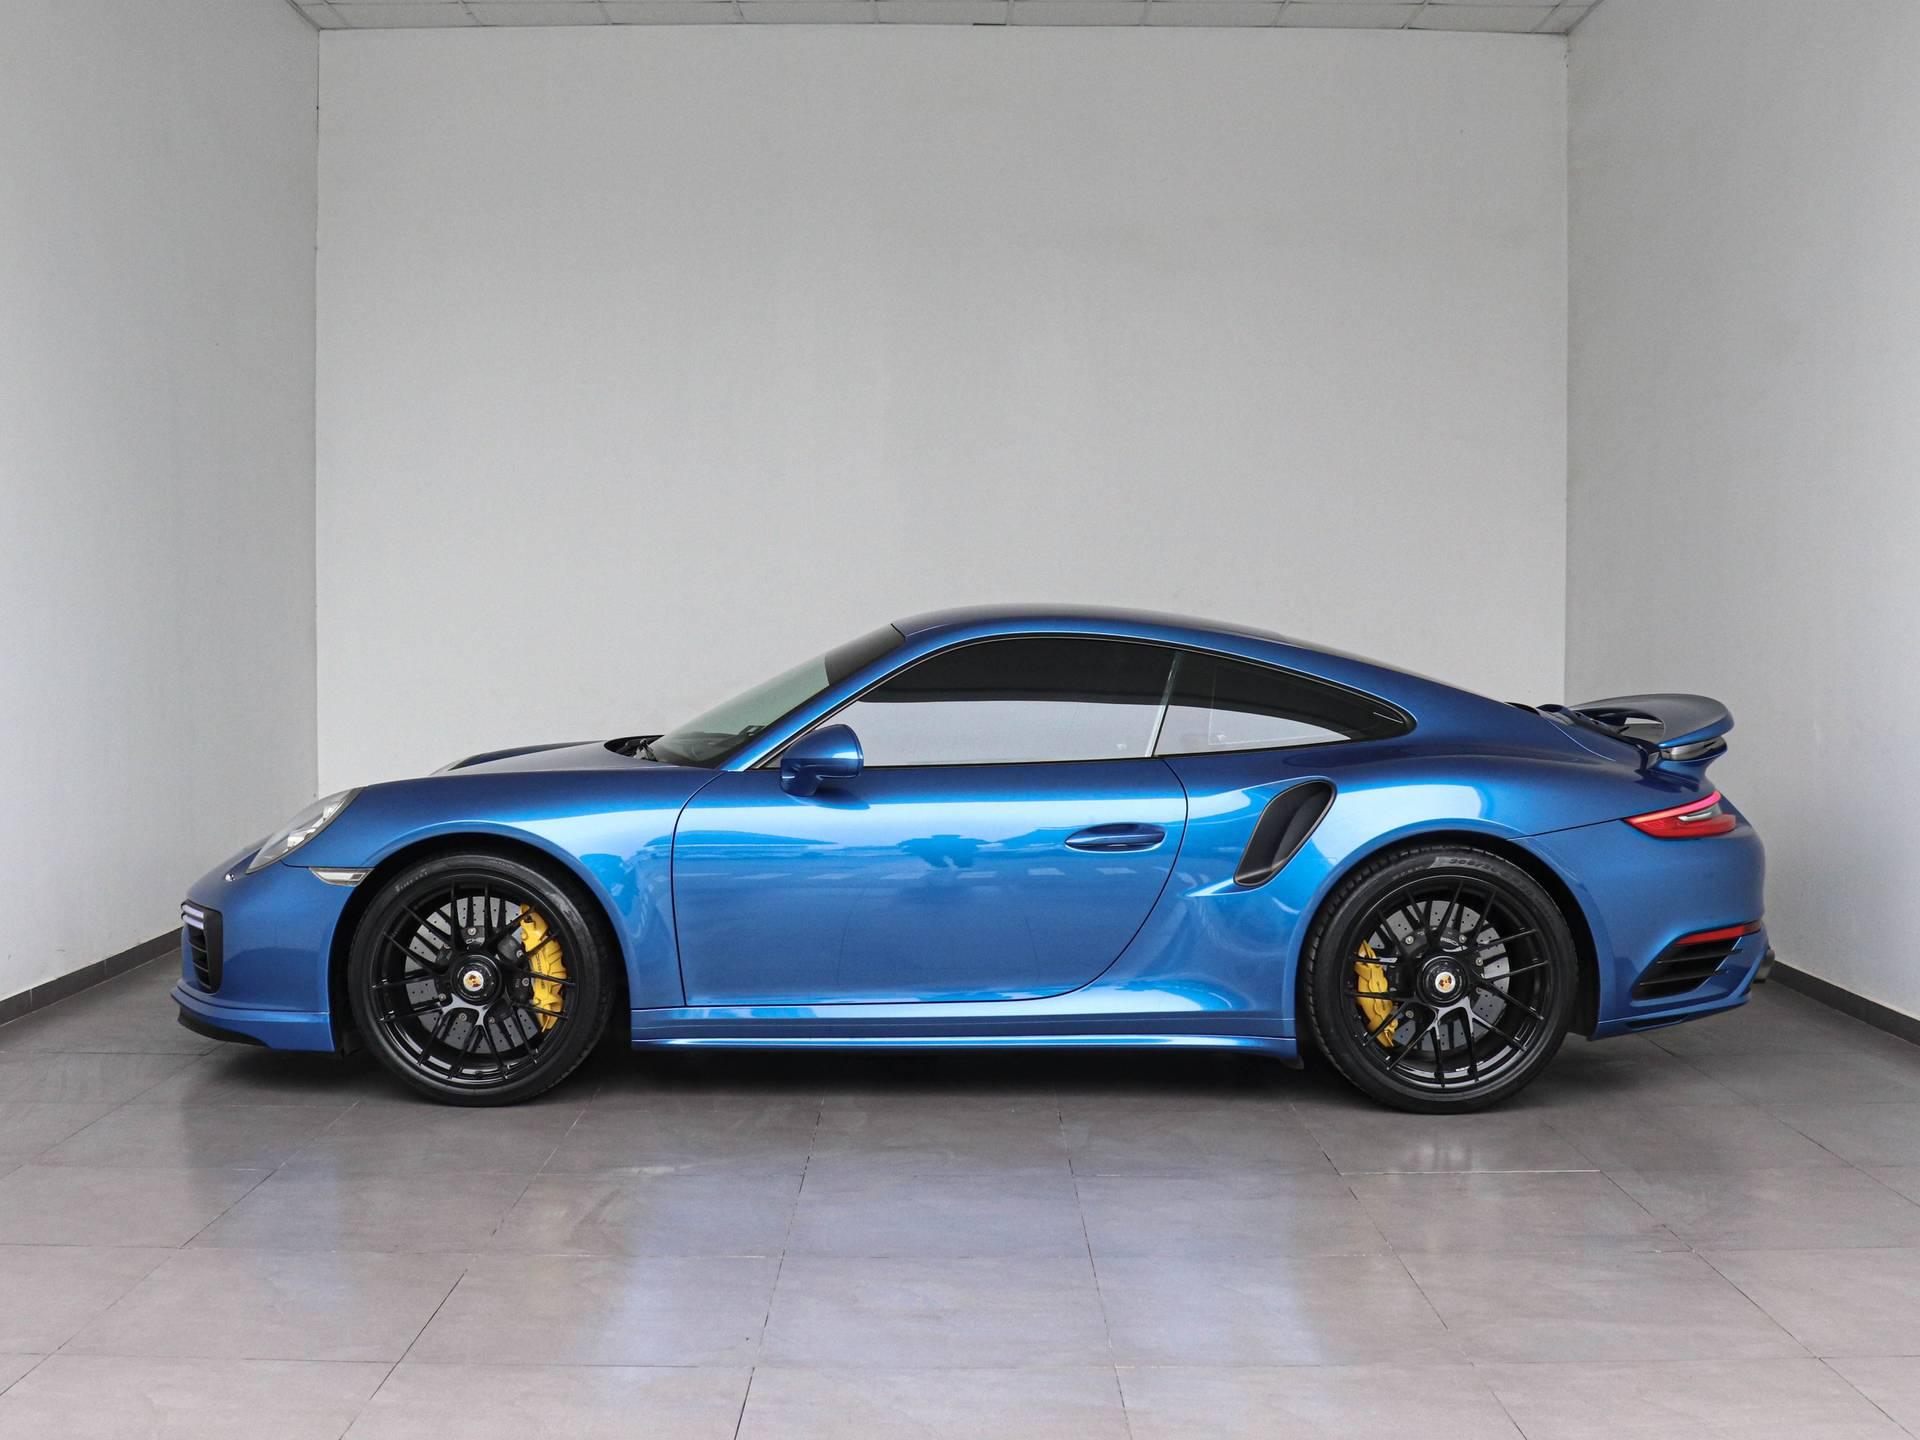 2017 Porsche 911 Turbo S – 2